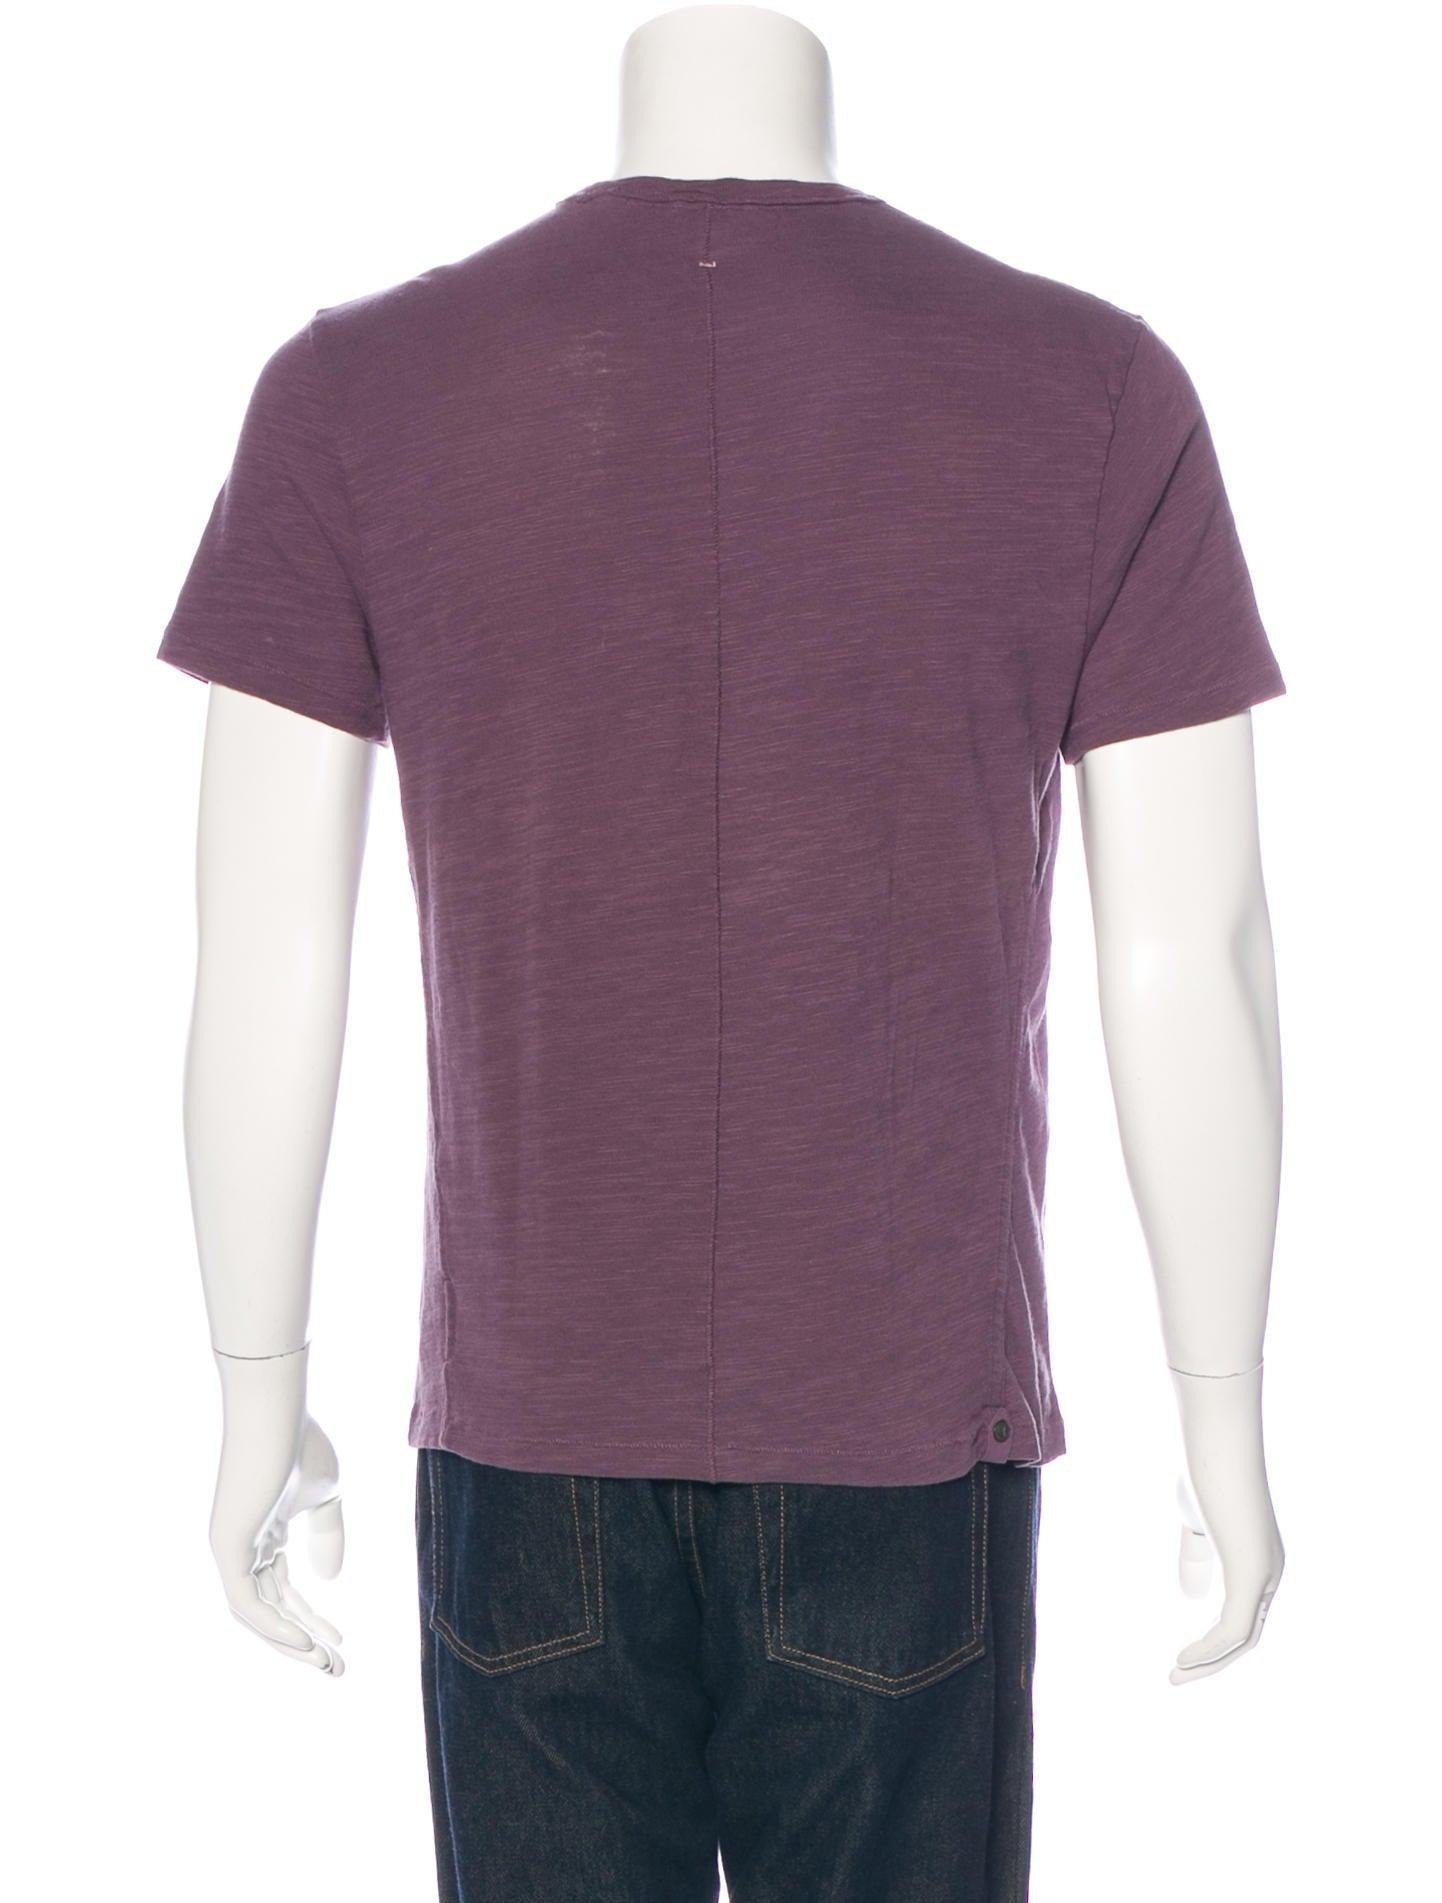 Rag Bone Crew Neck T Shirt Clothing Wragb67119 The